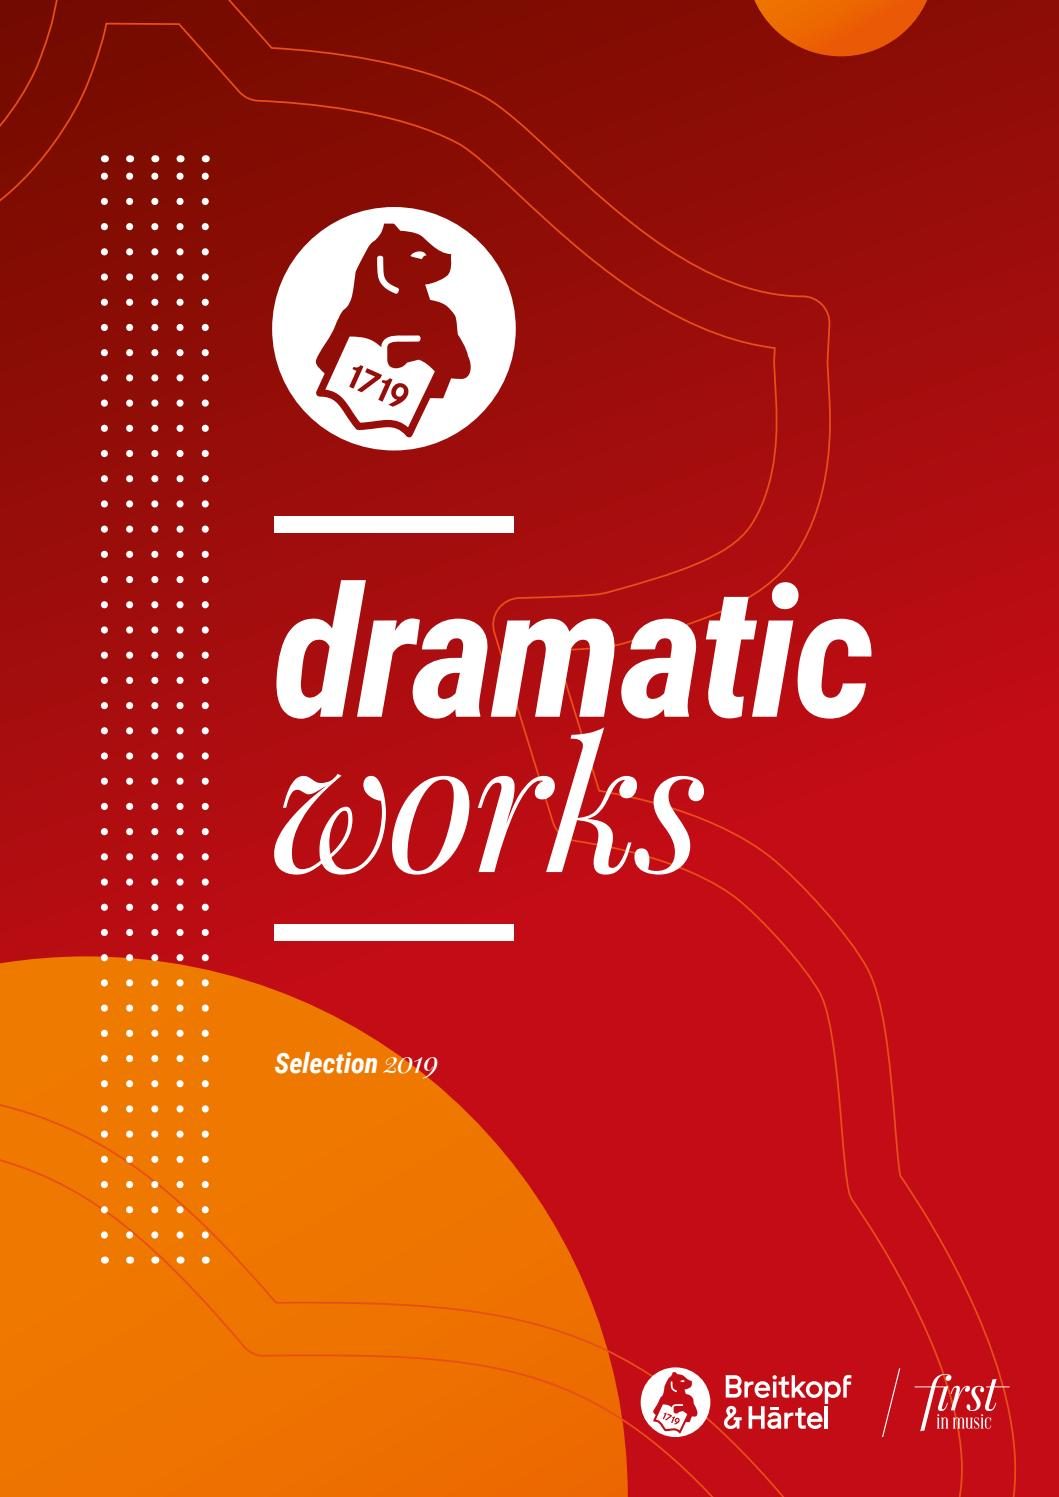 Dramatic Works | Selection 2019 by Breitkopf & Härtel - issuu